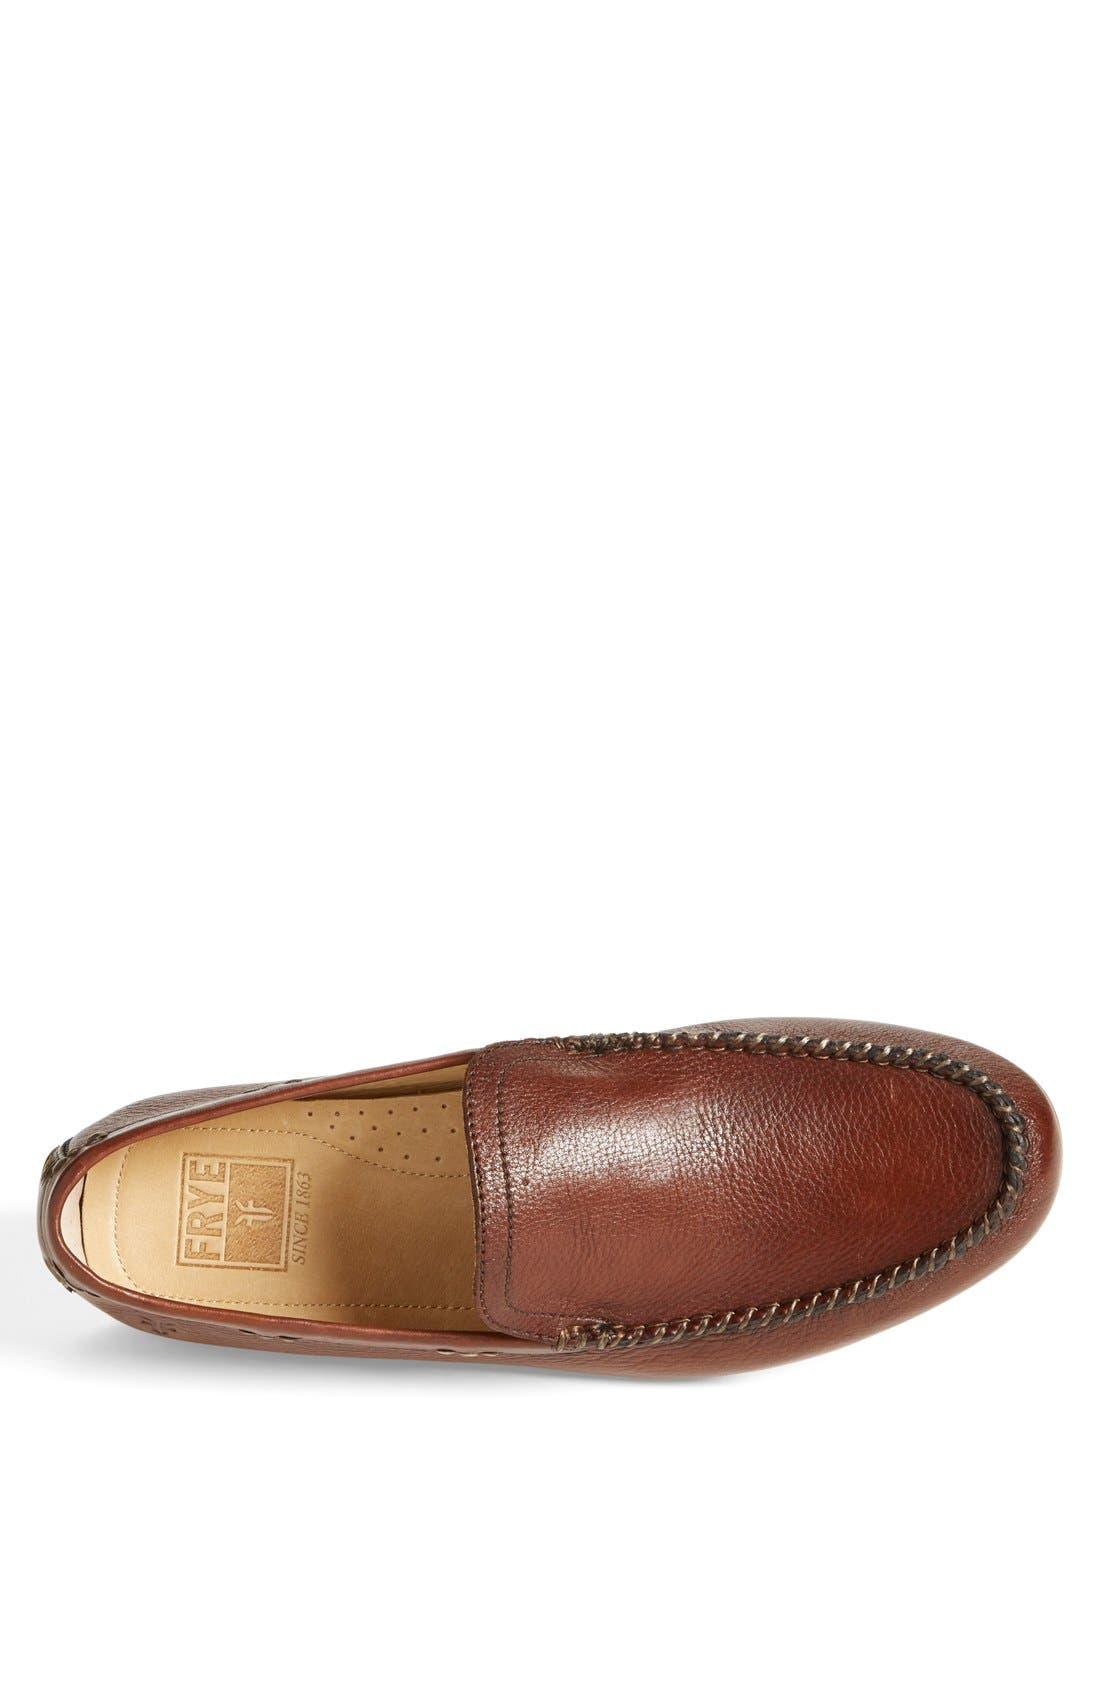 Alternate Image 3  - Frye 'Lewis' Venetian Loafer (Men)